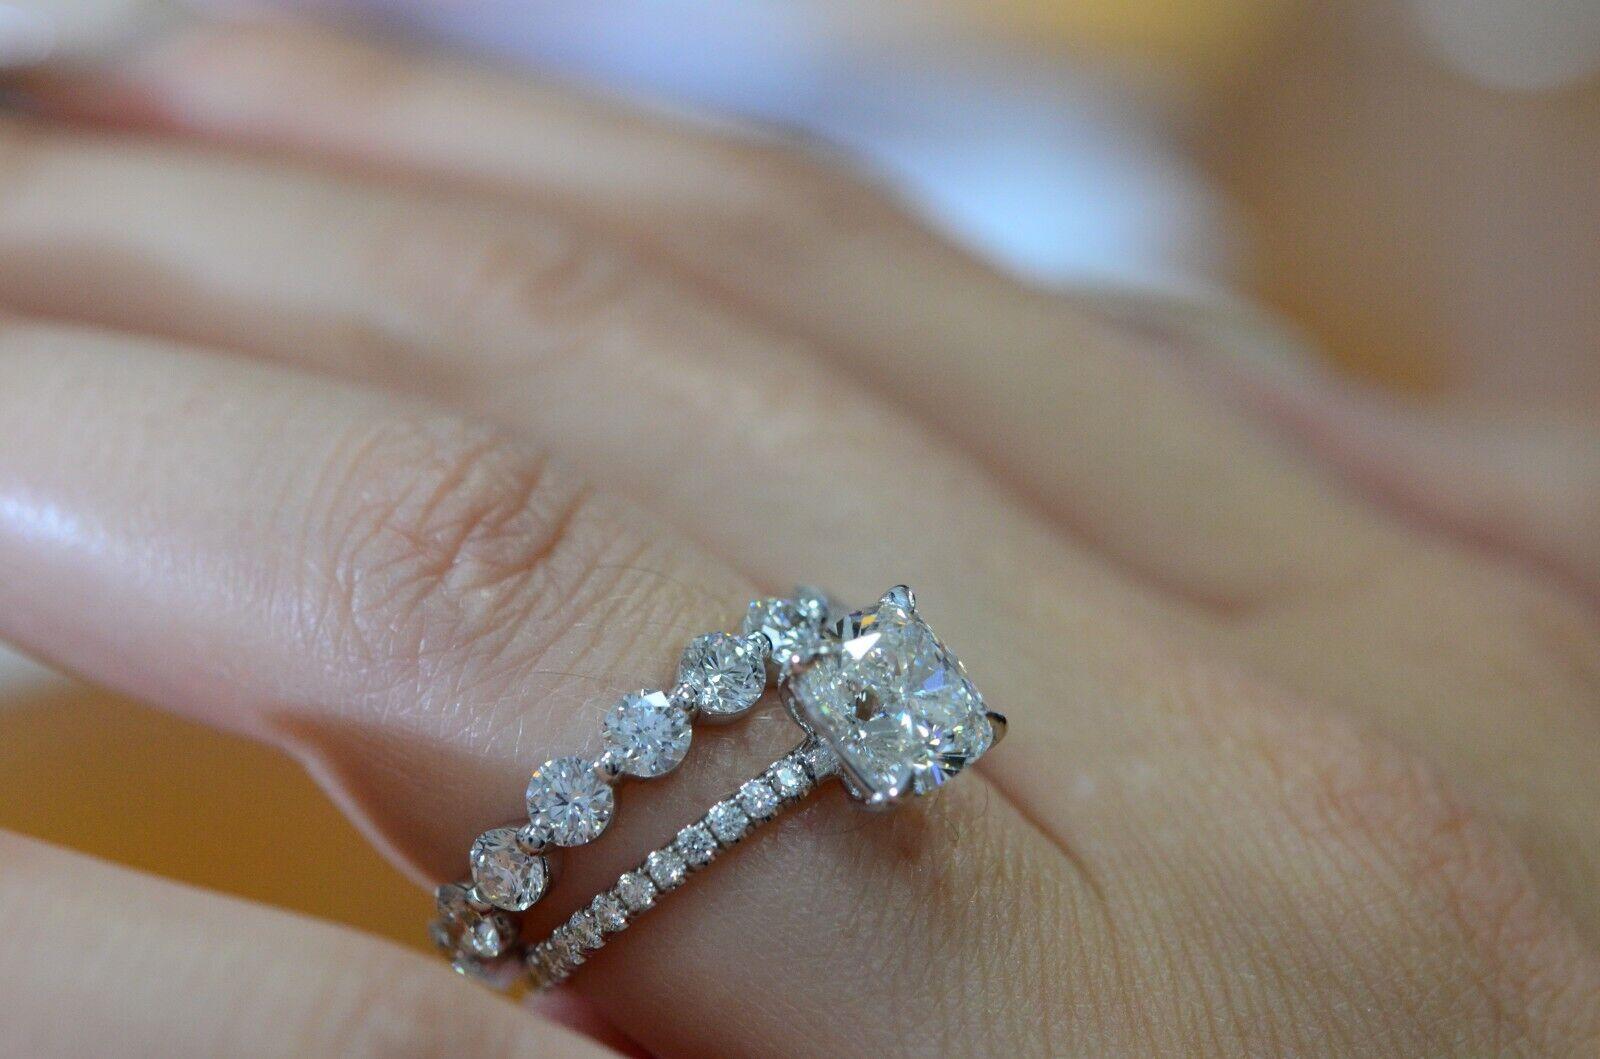 3.30 TCW Natural Cushion Cut Pave Diamond Ring w/ an Eternity Wedding Band - GIA 1